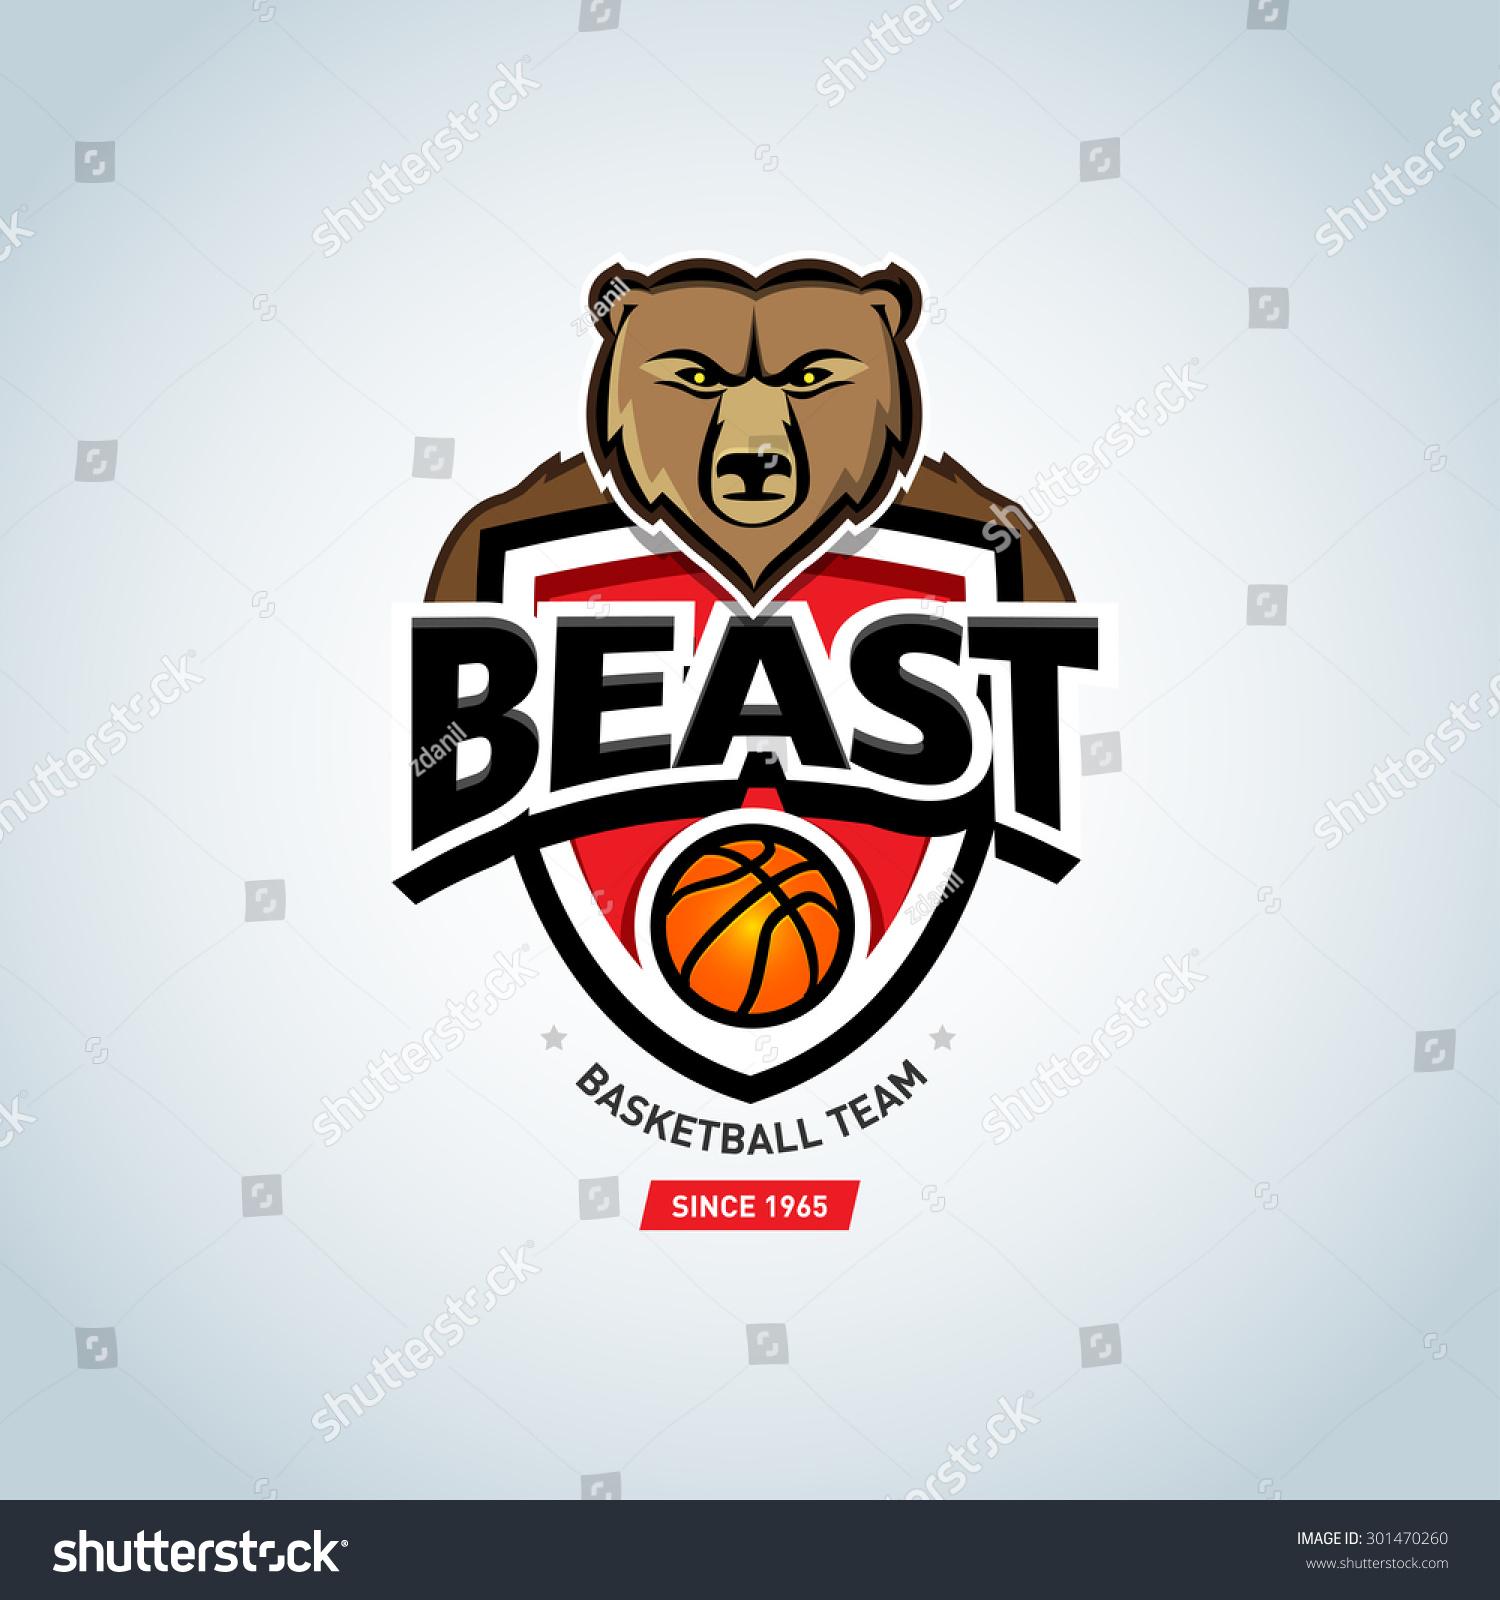 bear sport logo basketball logo template stock vector 301470260 shutterstock. Black Bedroom Furniture Sets. Home Design Ideas